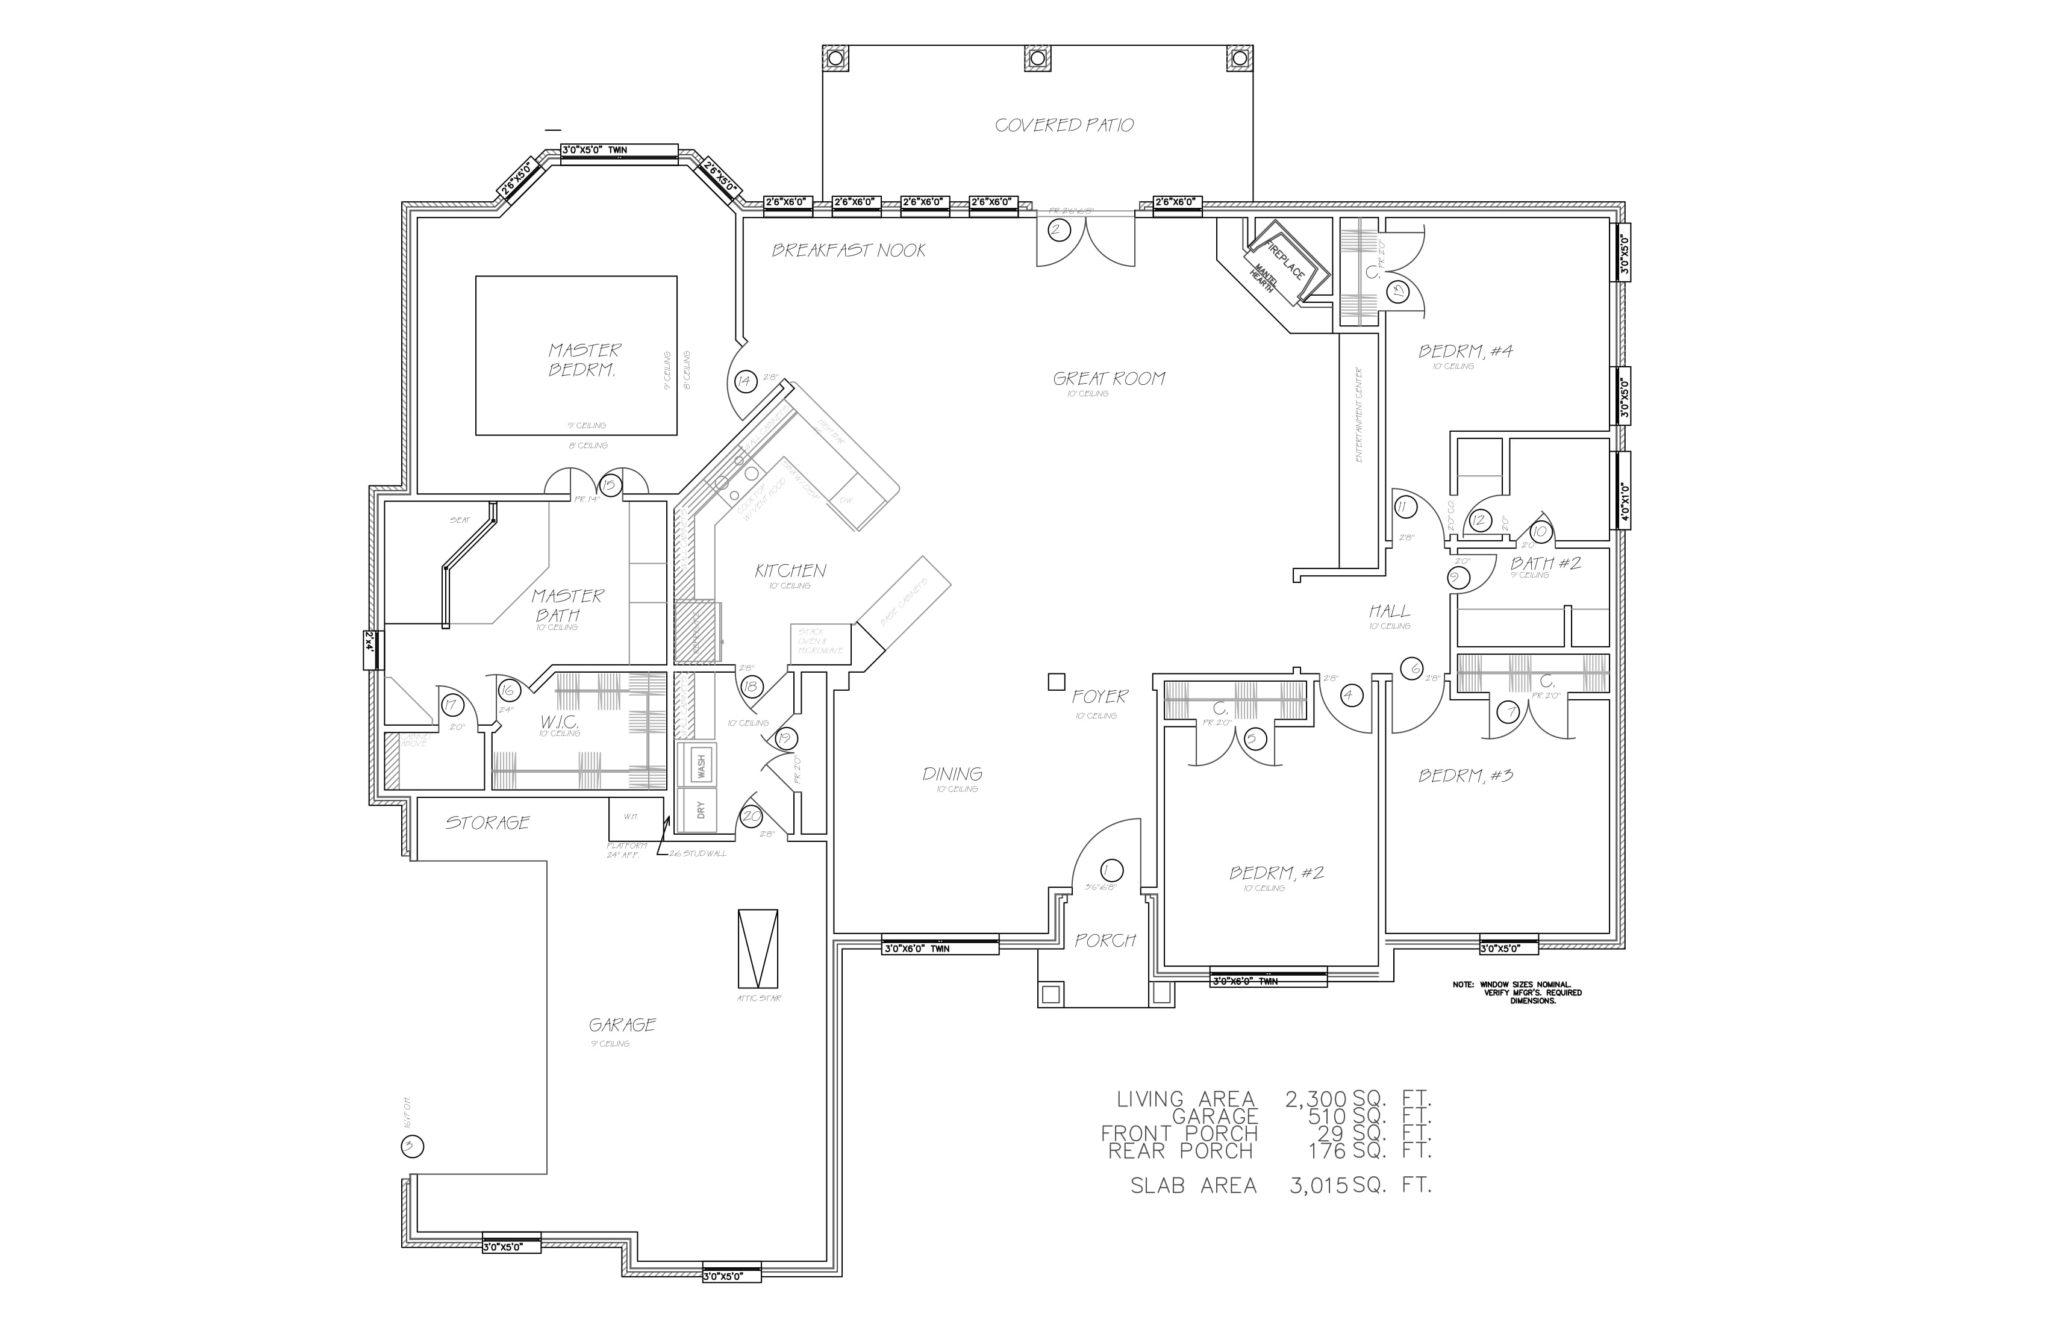 house-plan-10002-floor